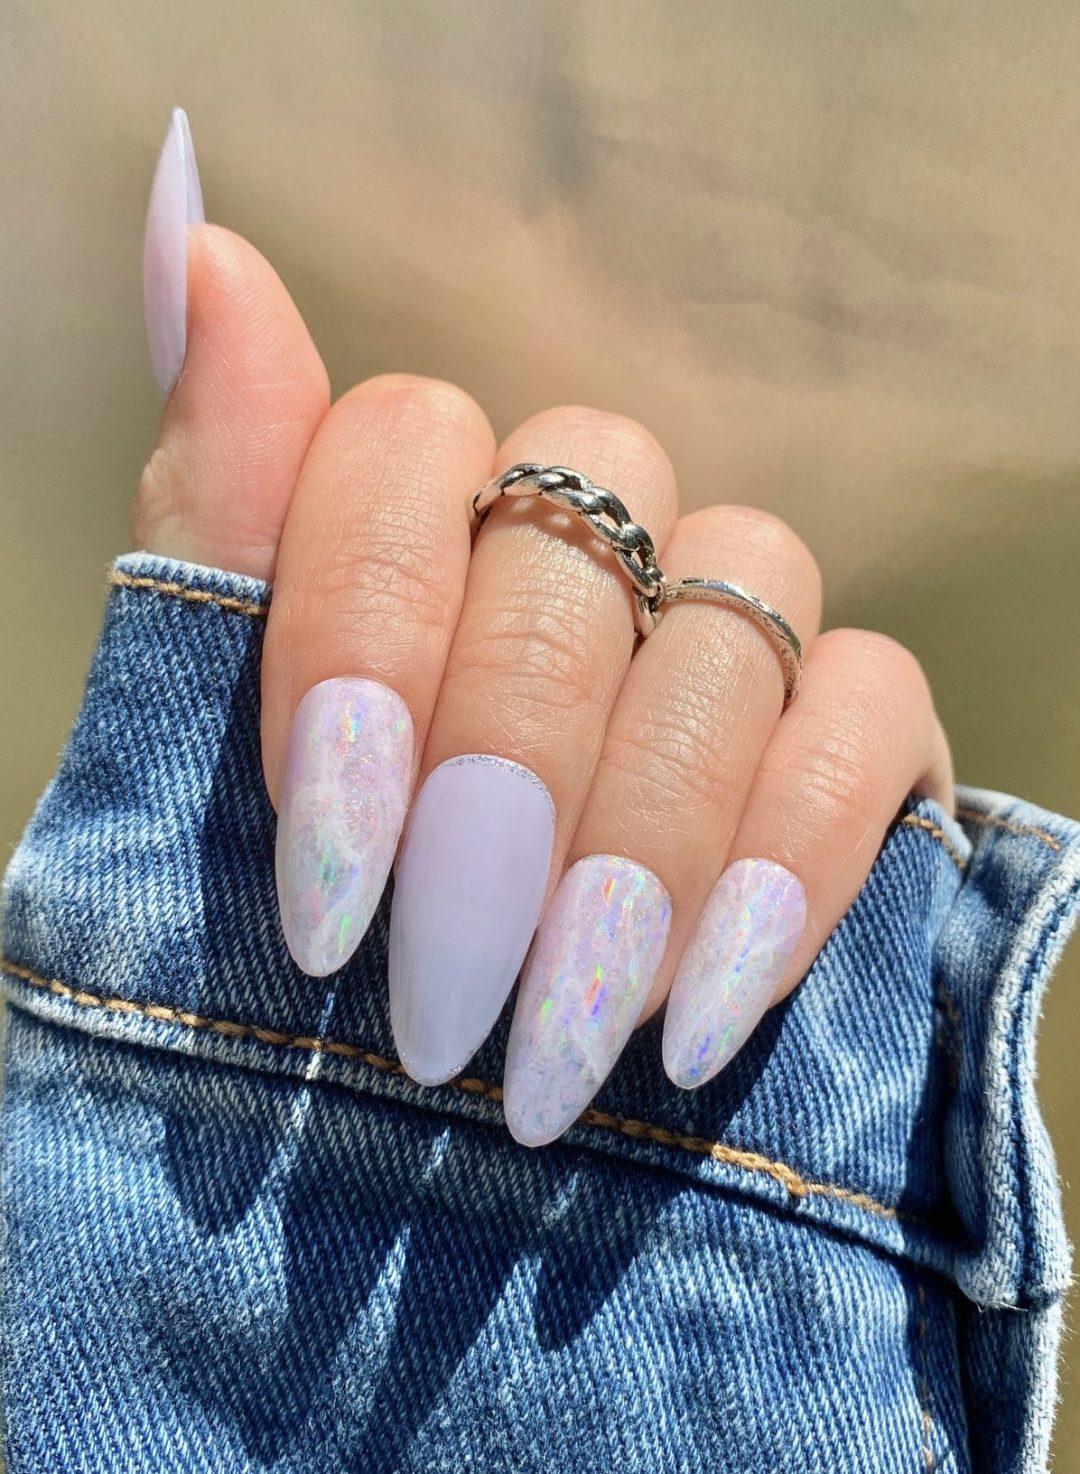 Holographic LavenderSpring Nails